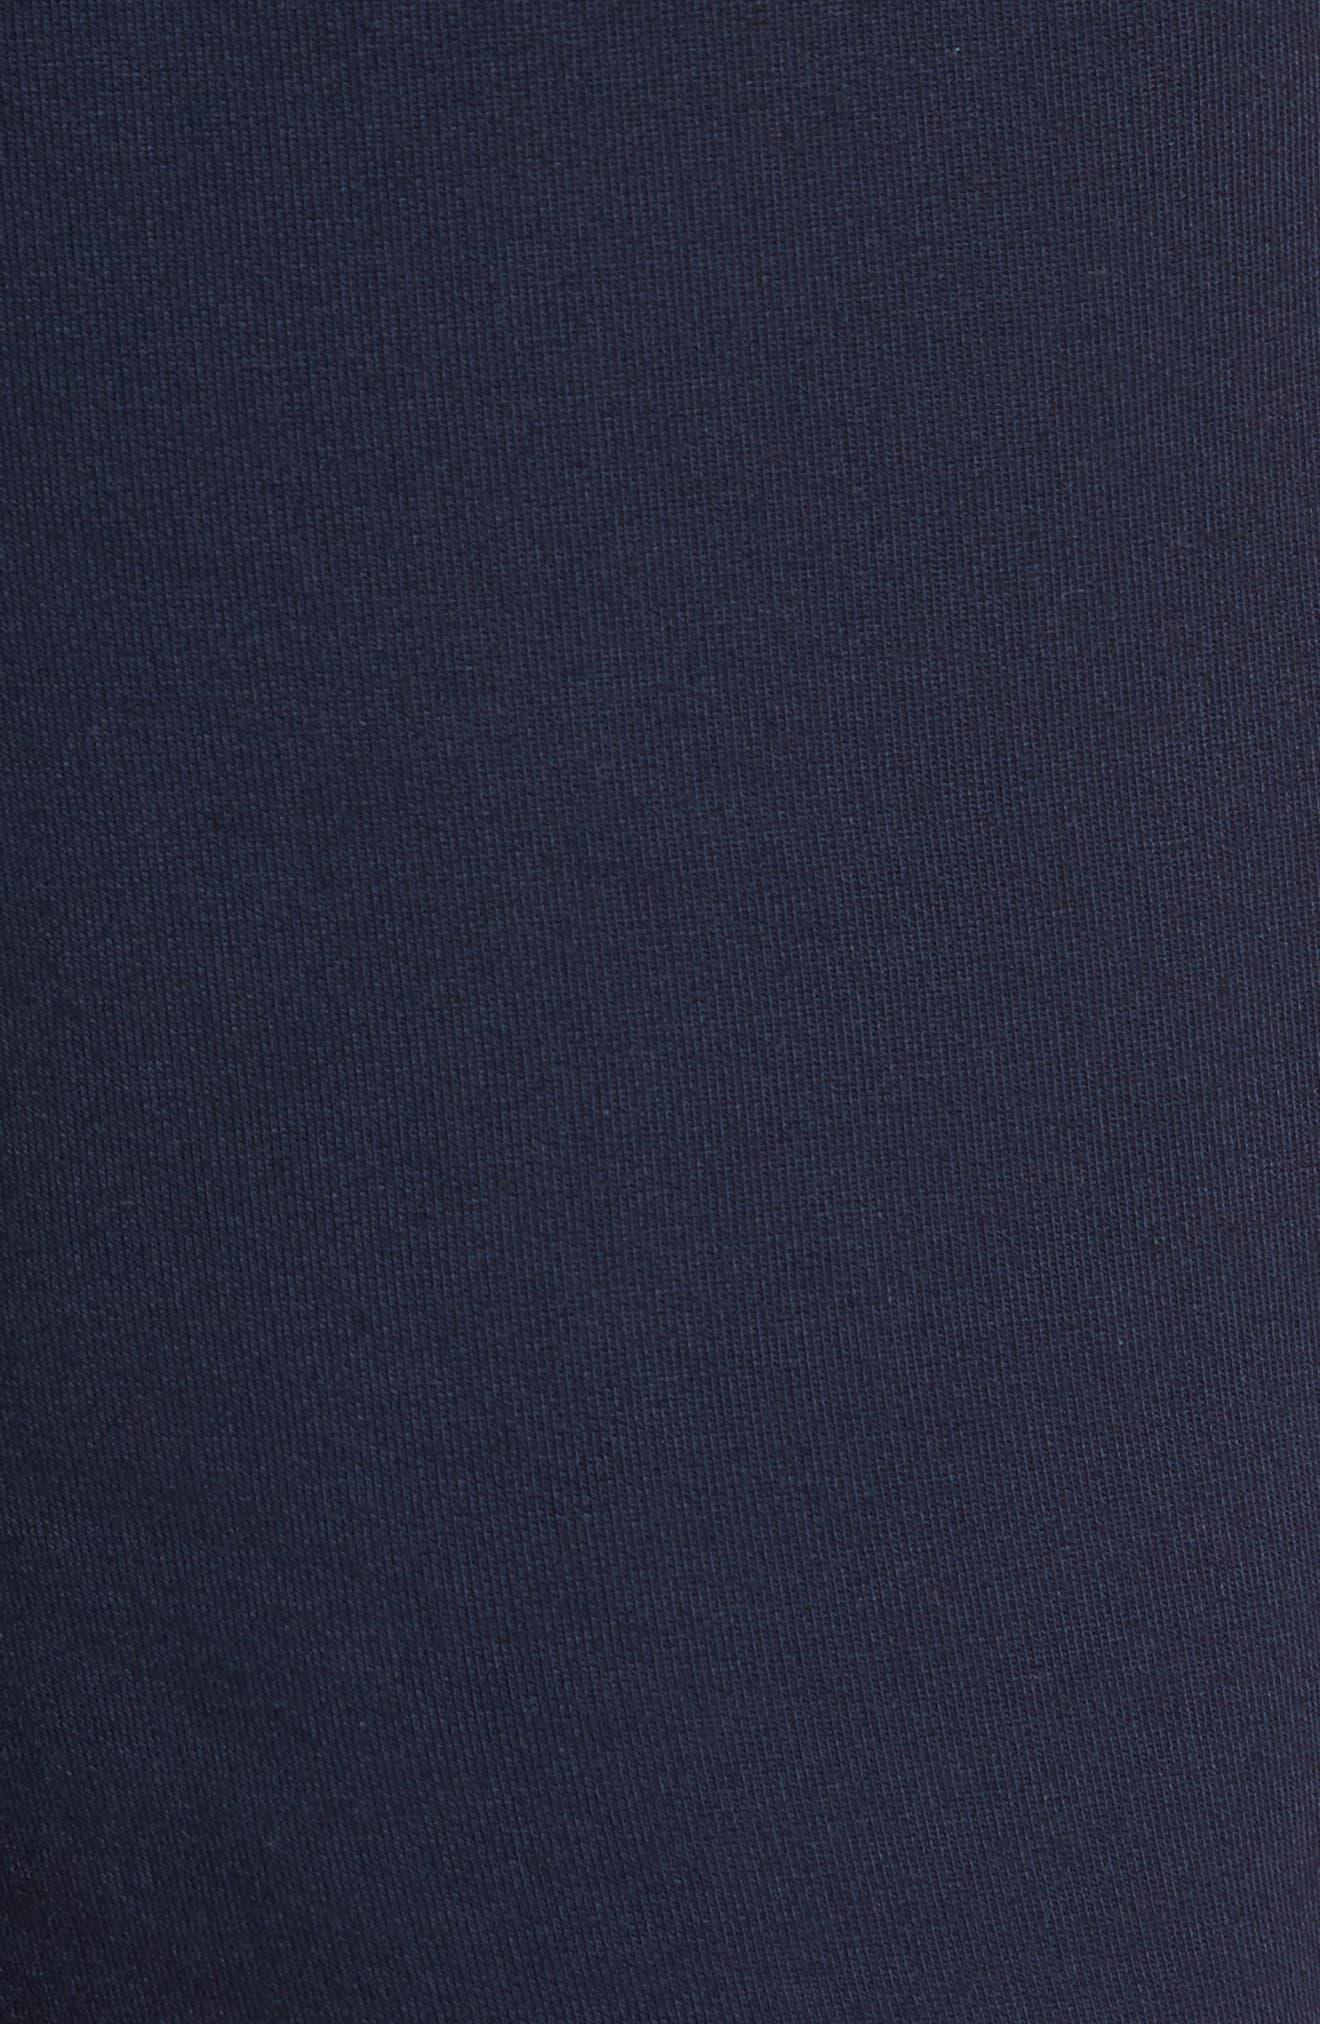 Modal Blend Lounge Shorts,                             Alternate thumbnail 5, color,                             411